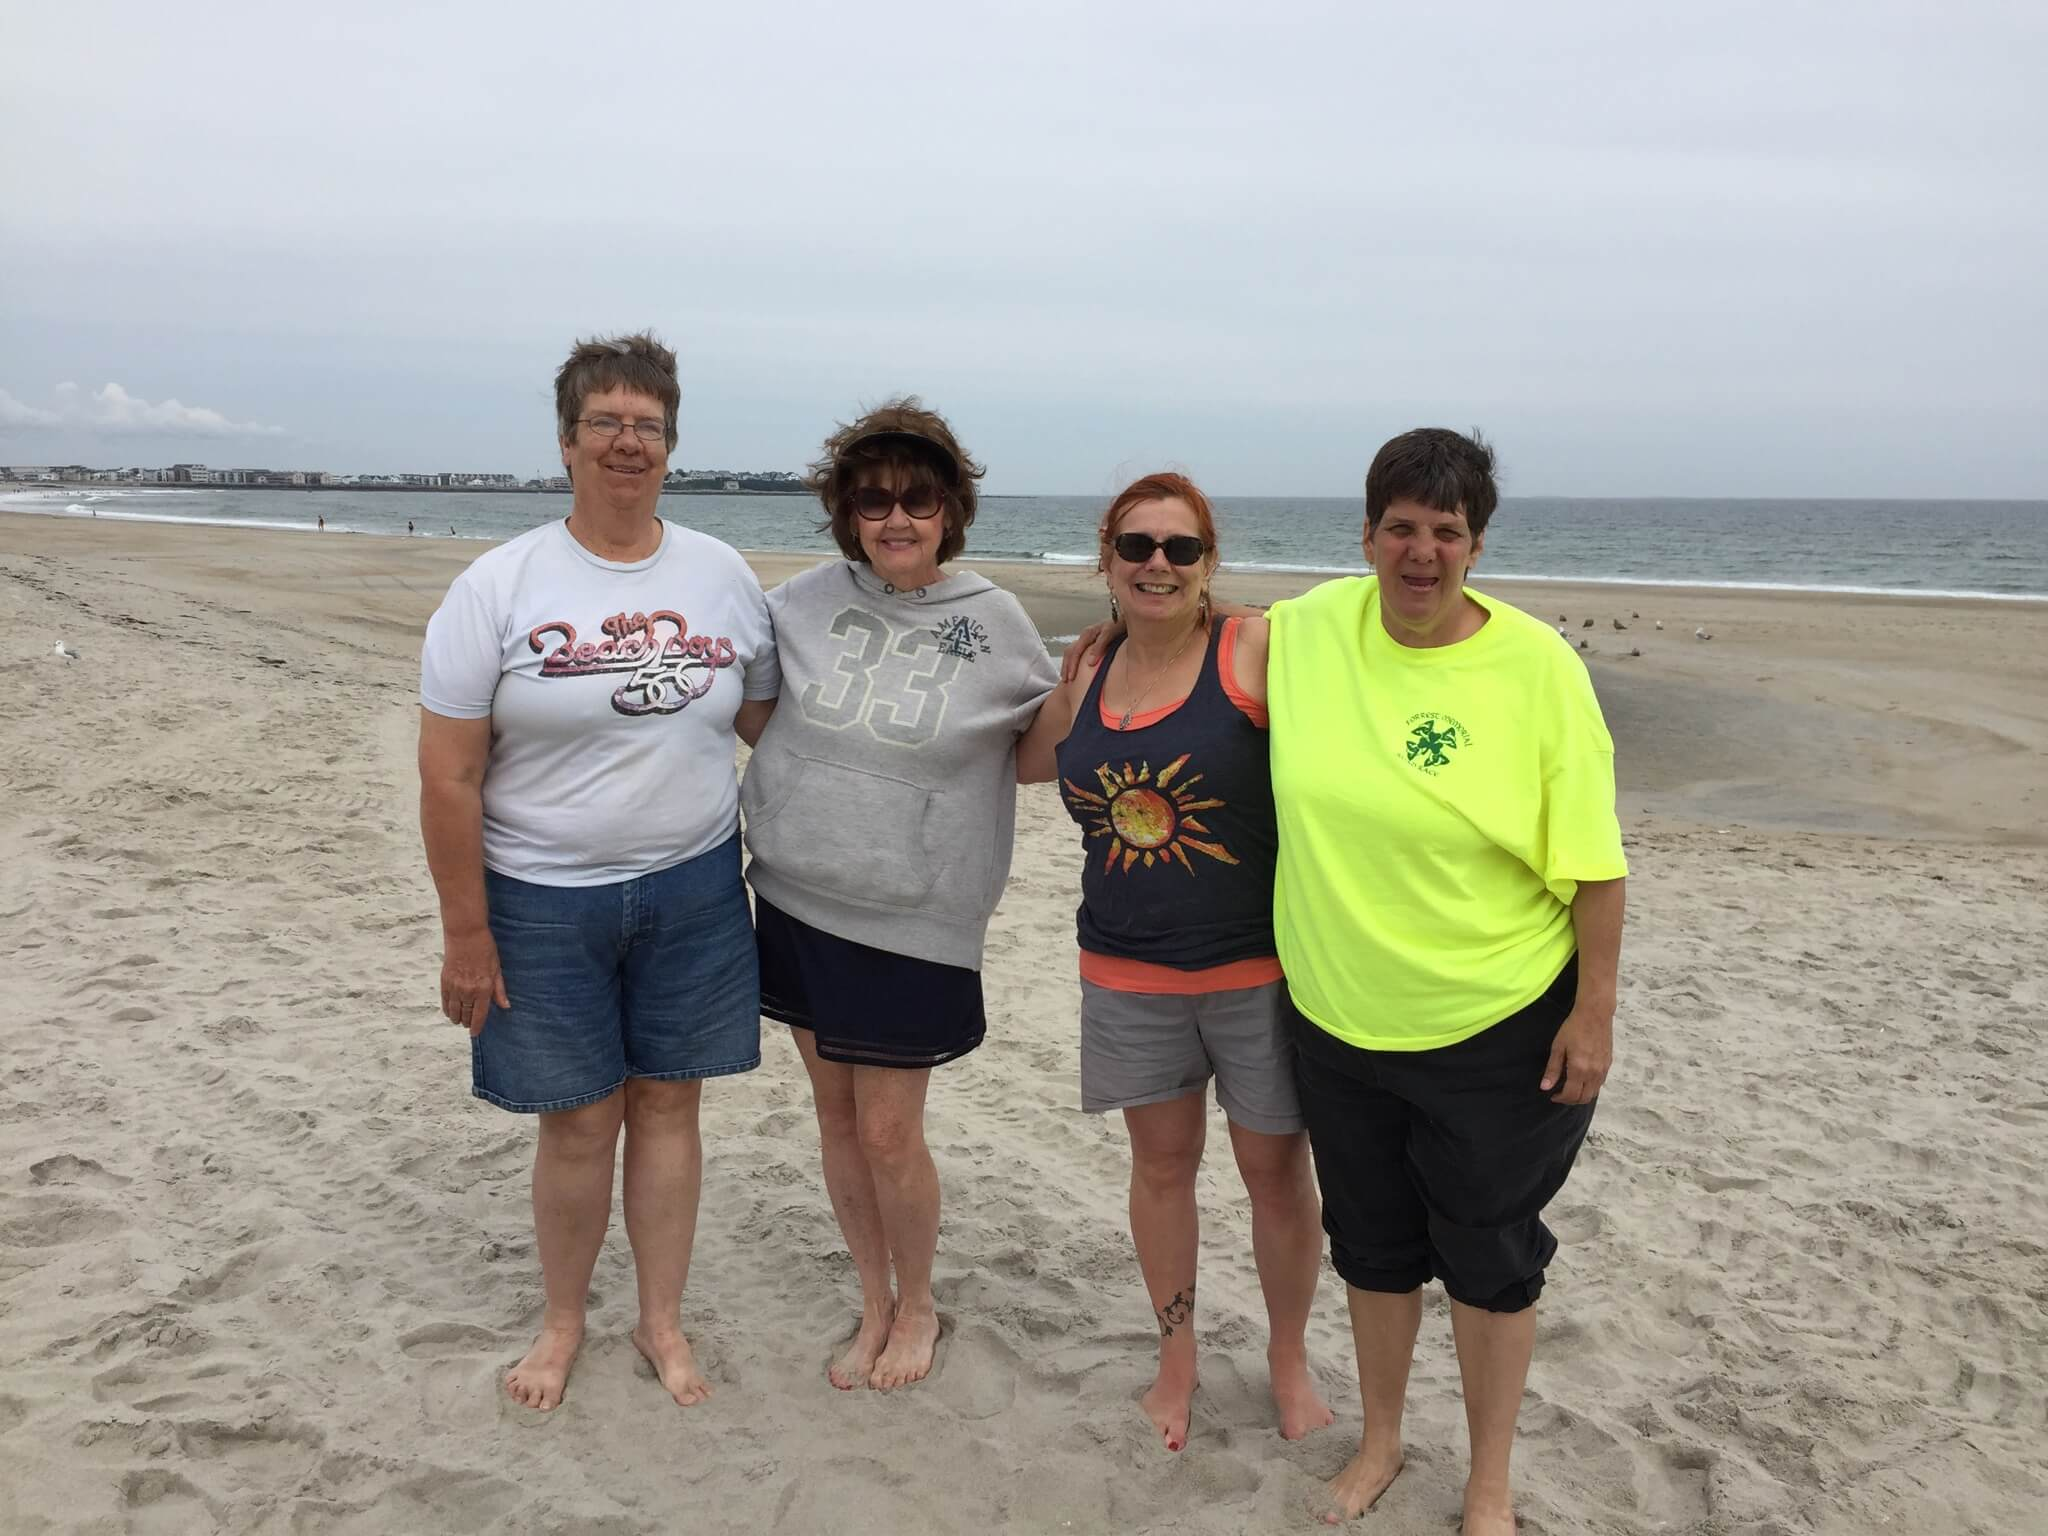 Thrive staff and participants at Hampton beach